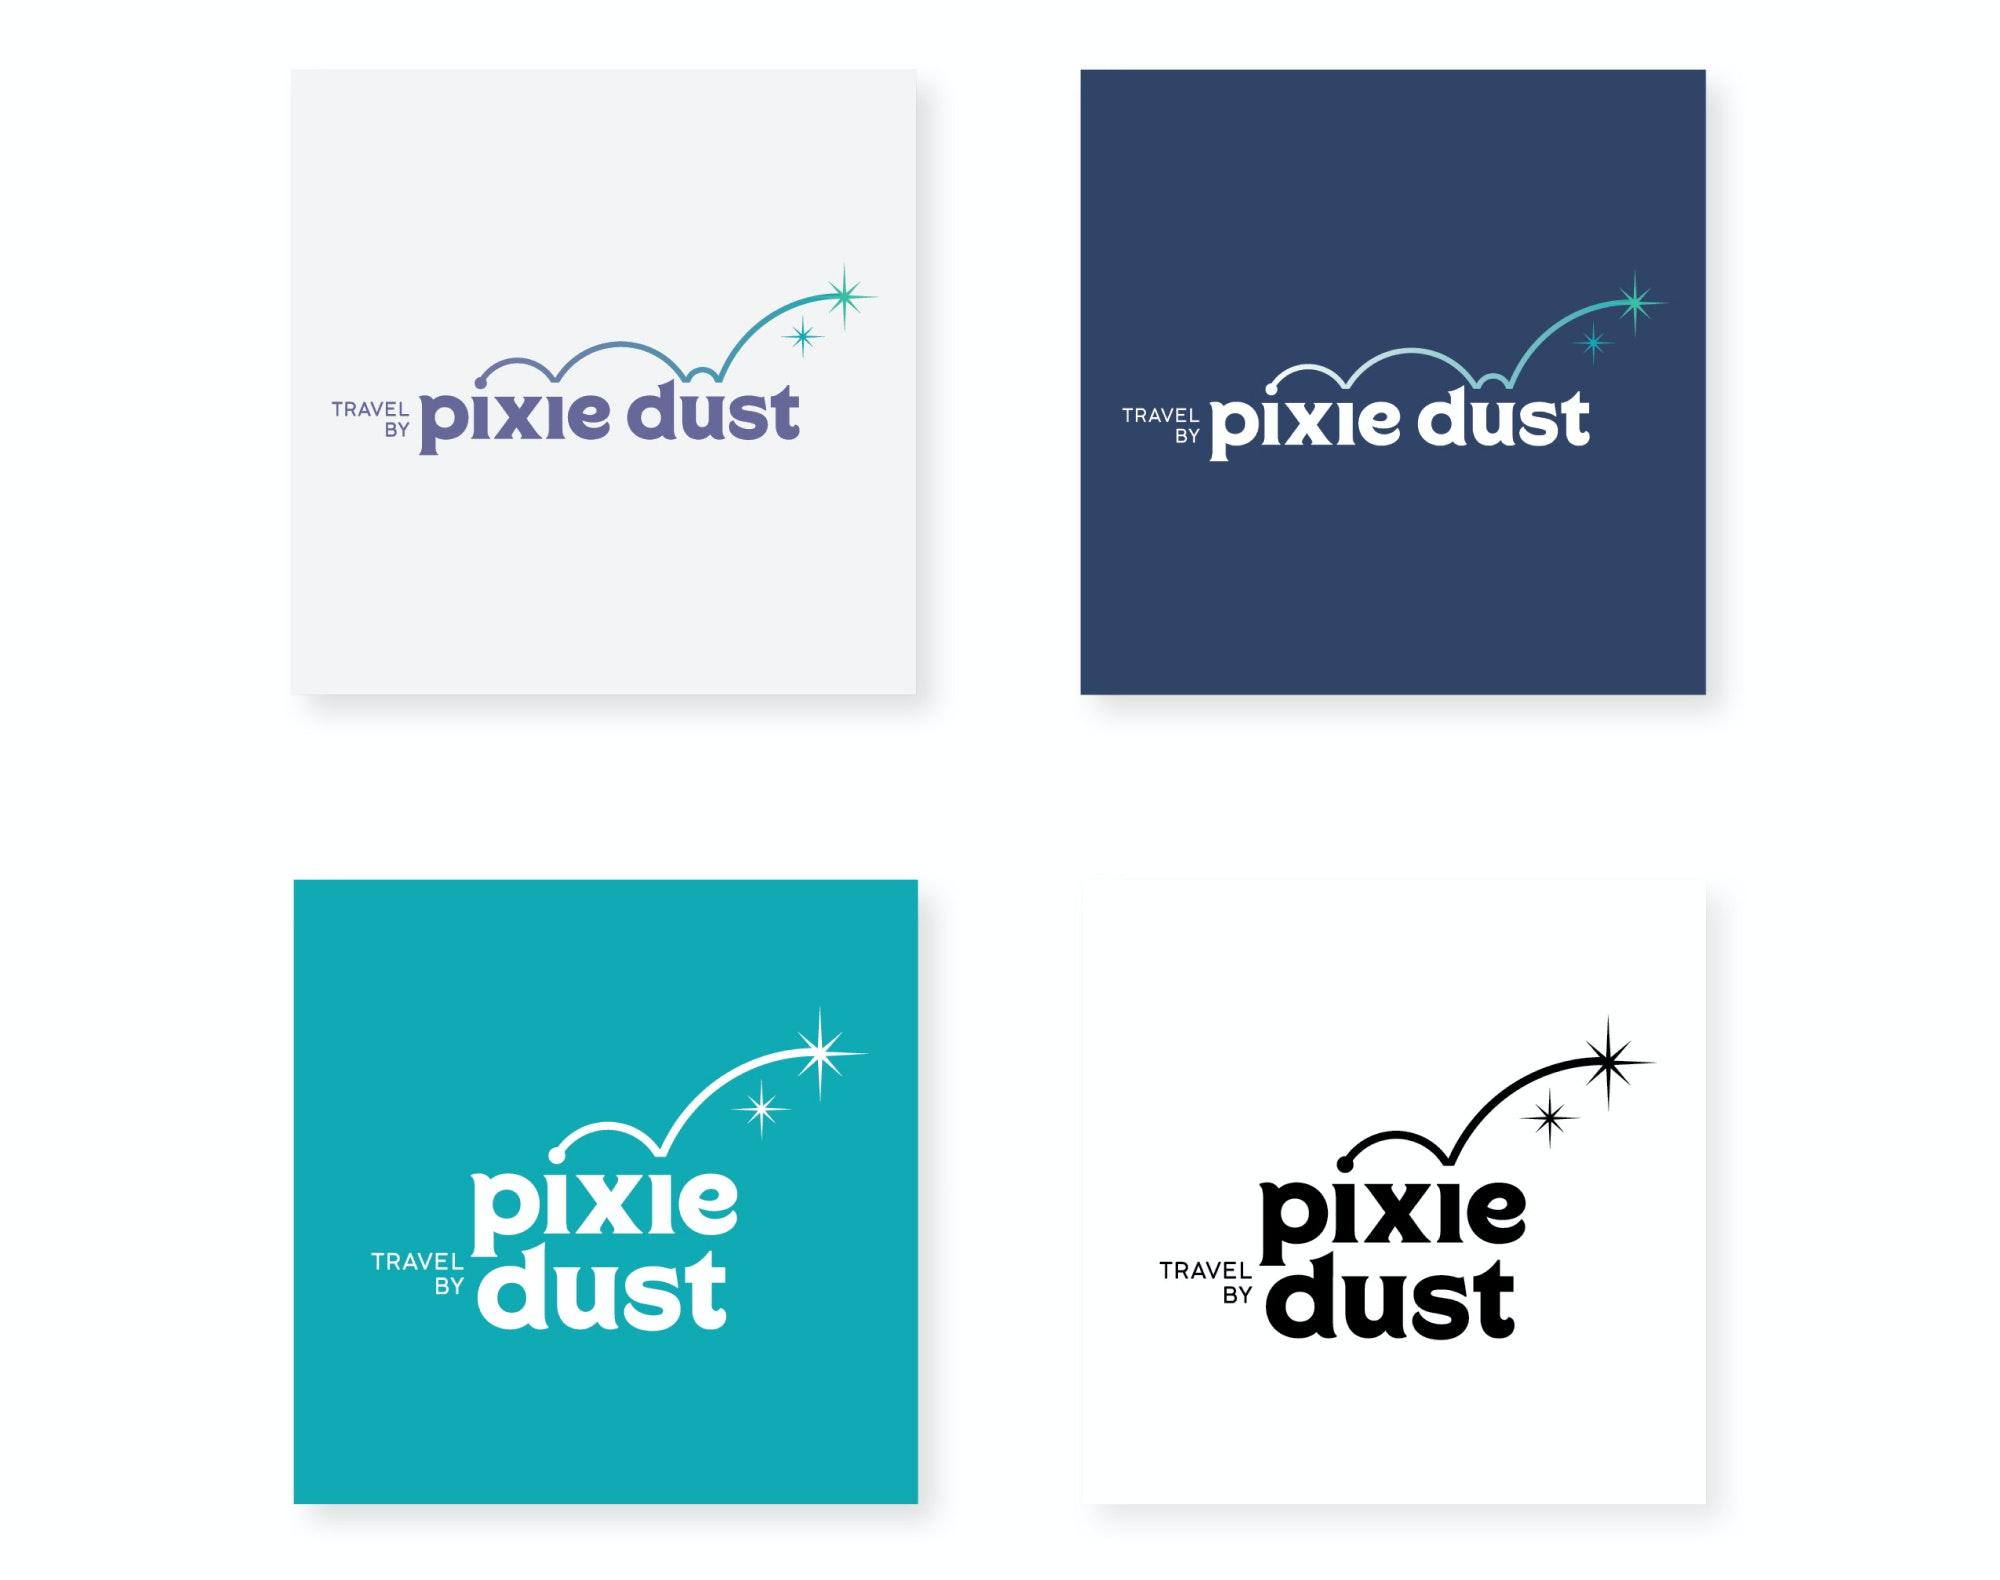 TBPD logo design variations